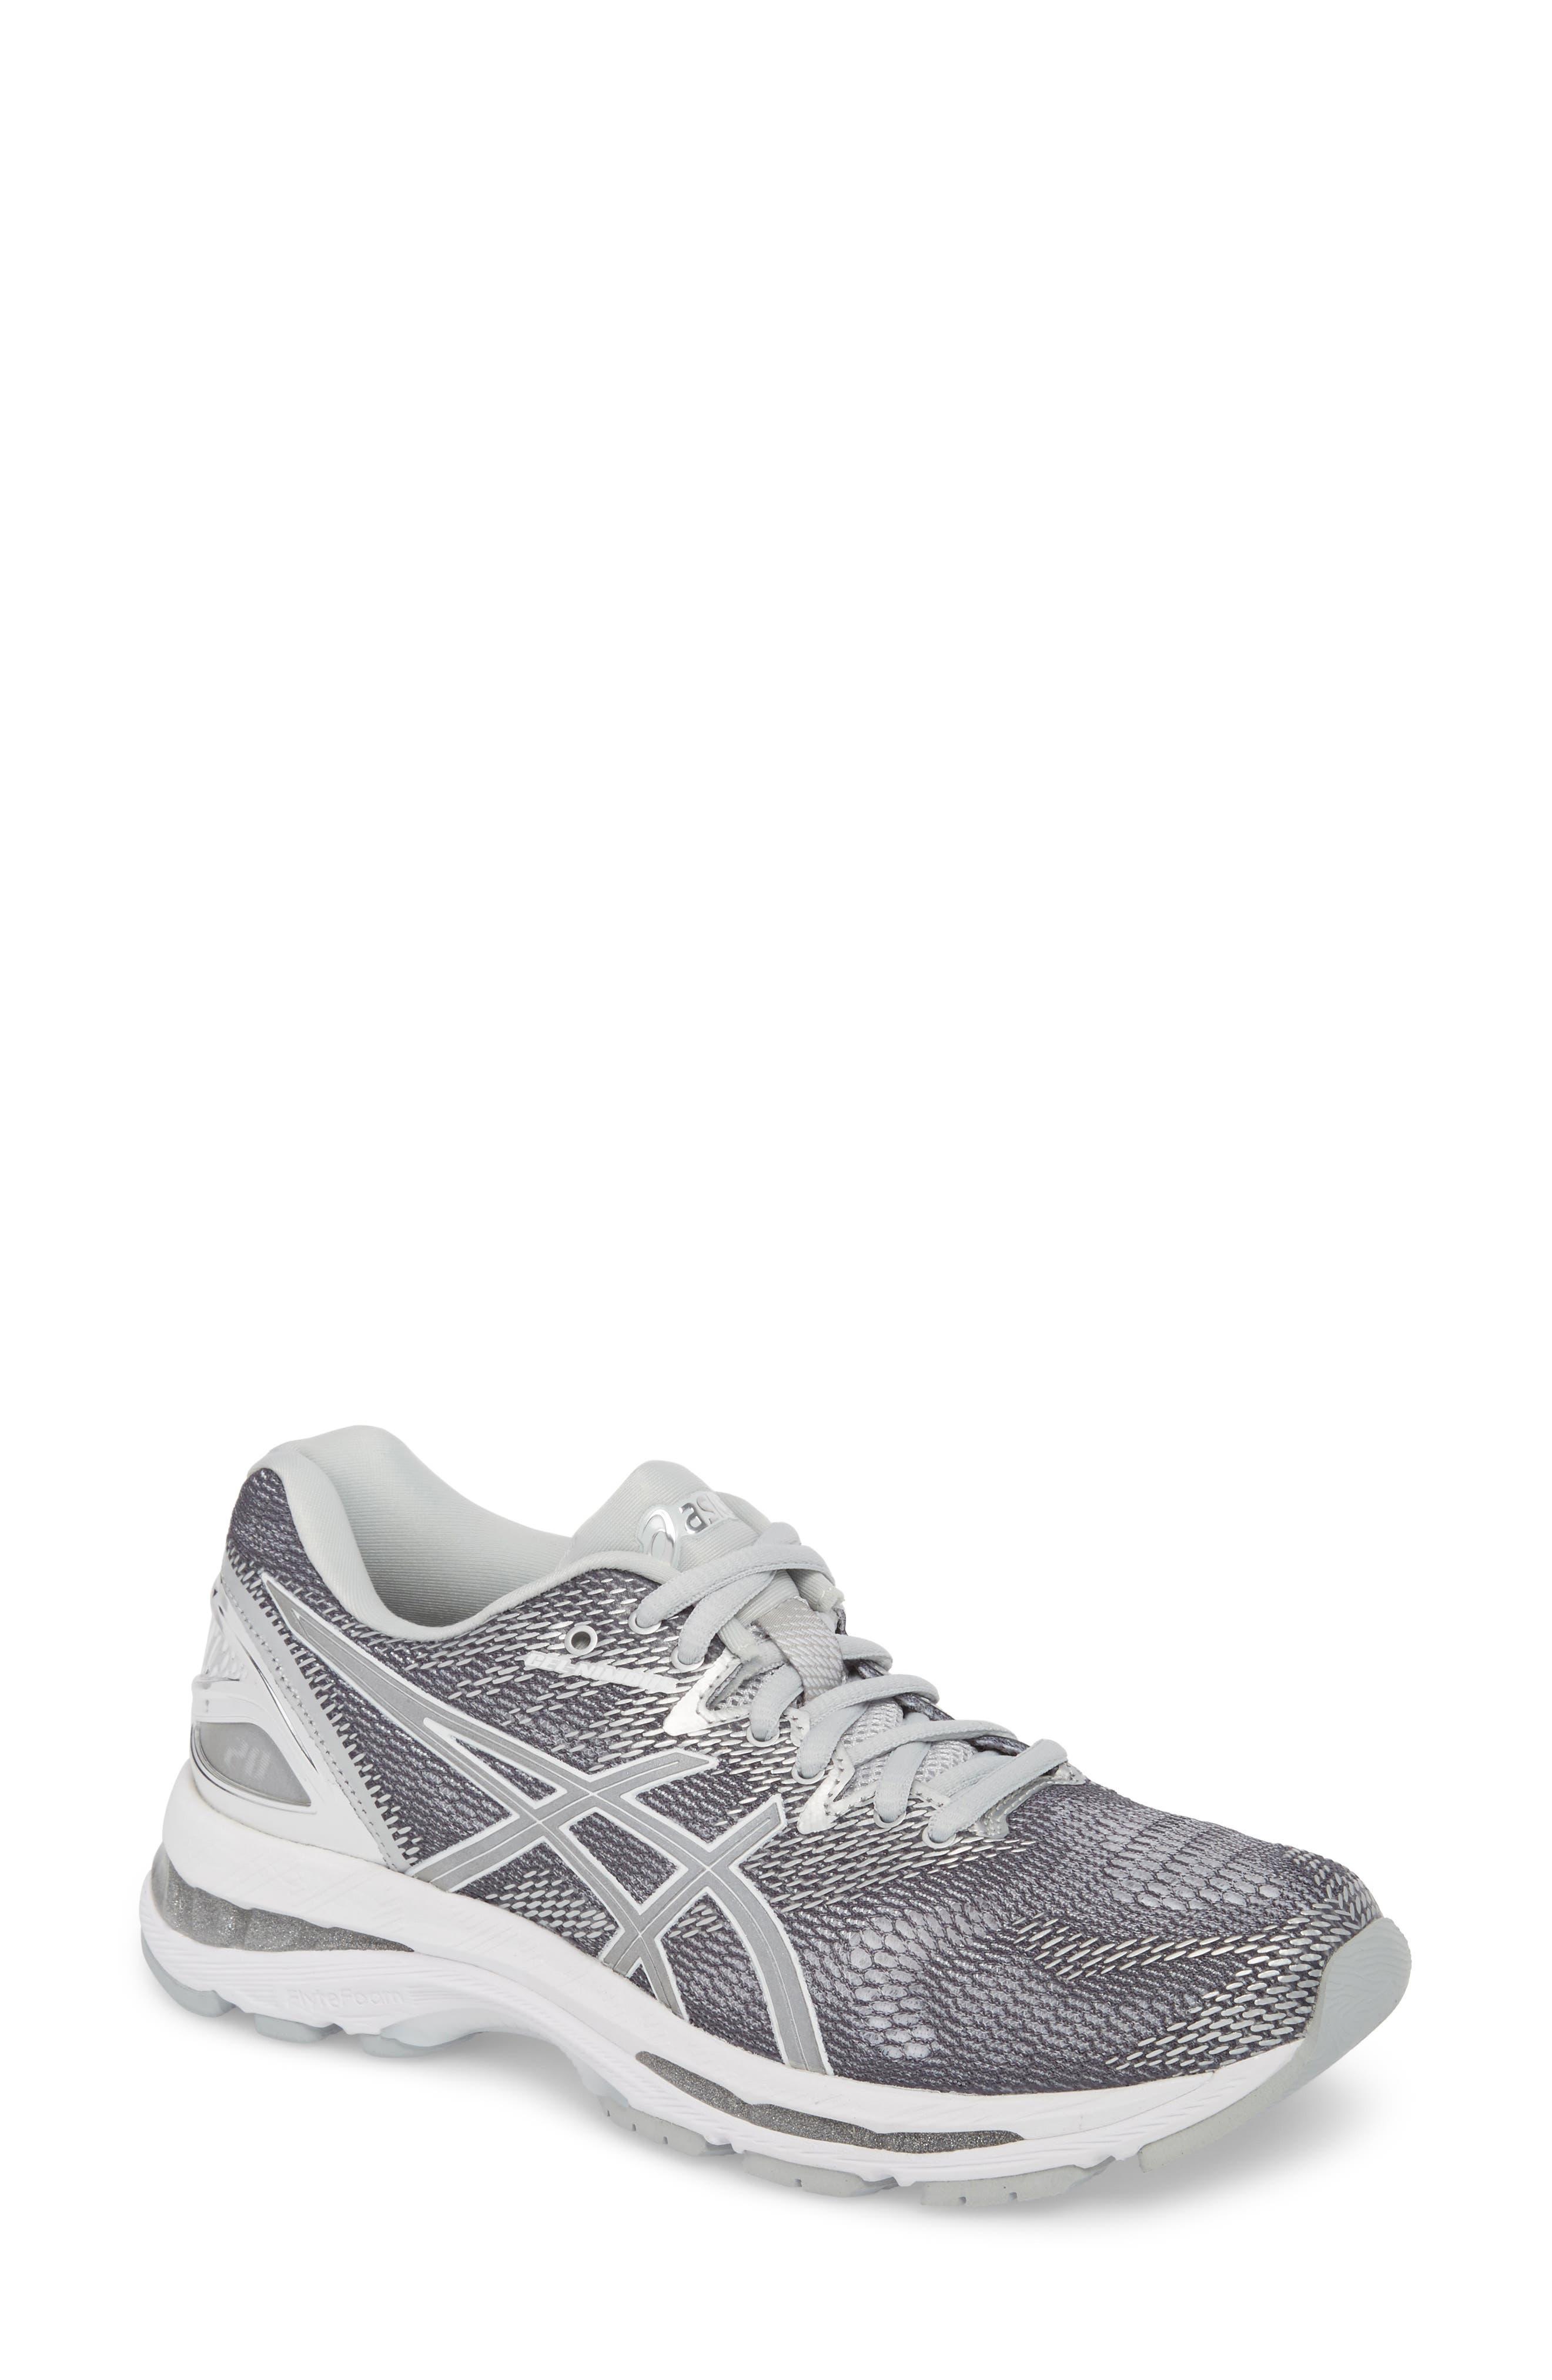 GEL-Nimbus 20 Platinum Running Shoe,                             Main thumbnail 1, color,                             097